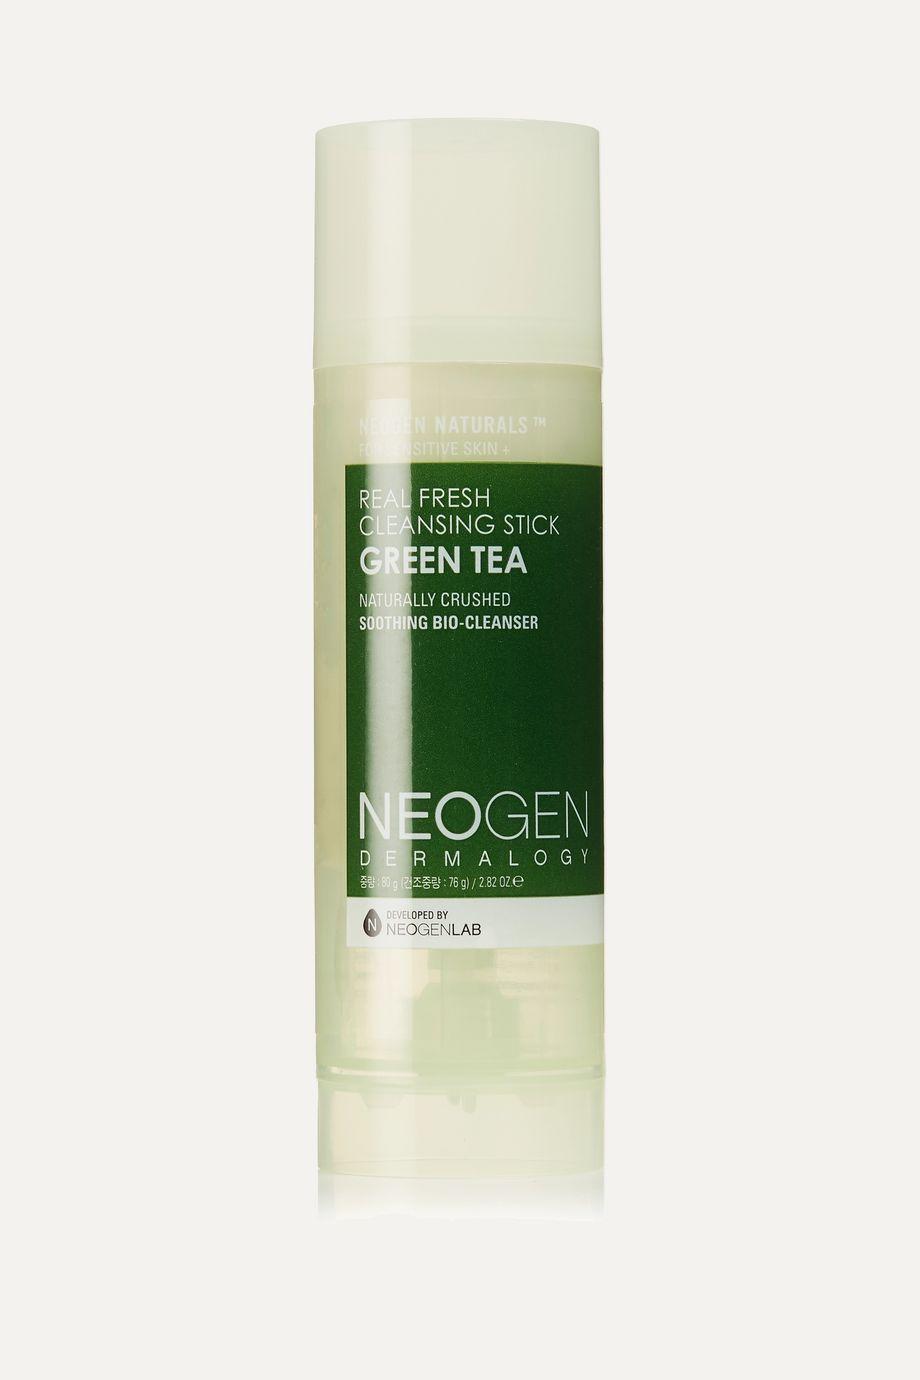 Neogen Real Fresh Cleansing Stick - Green Tea, 80g